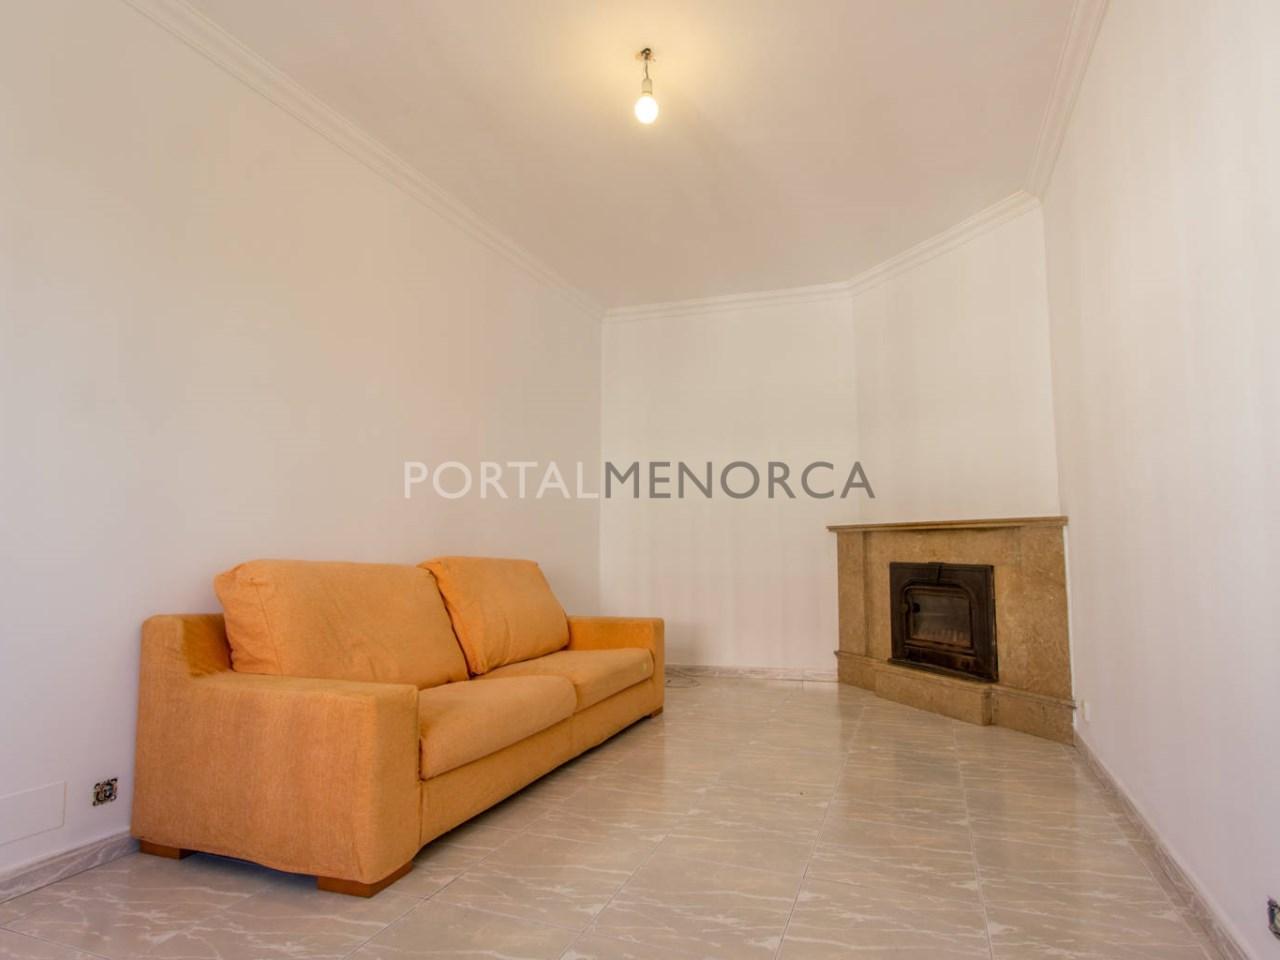 Casa con chimenea en venta en Alaior